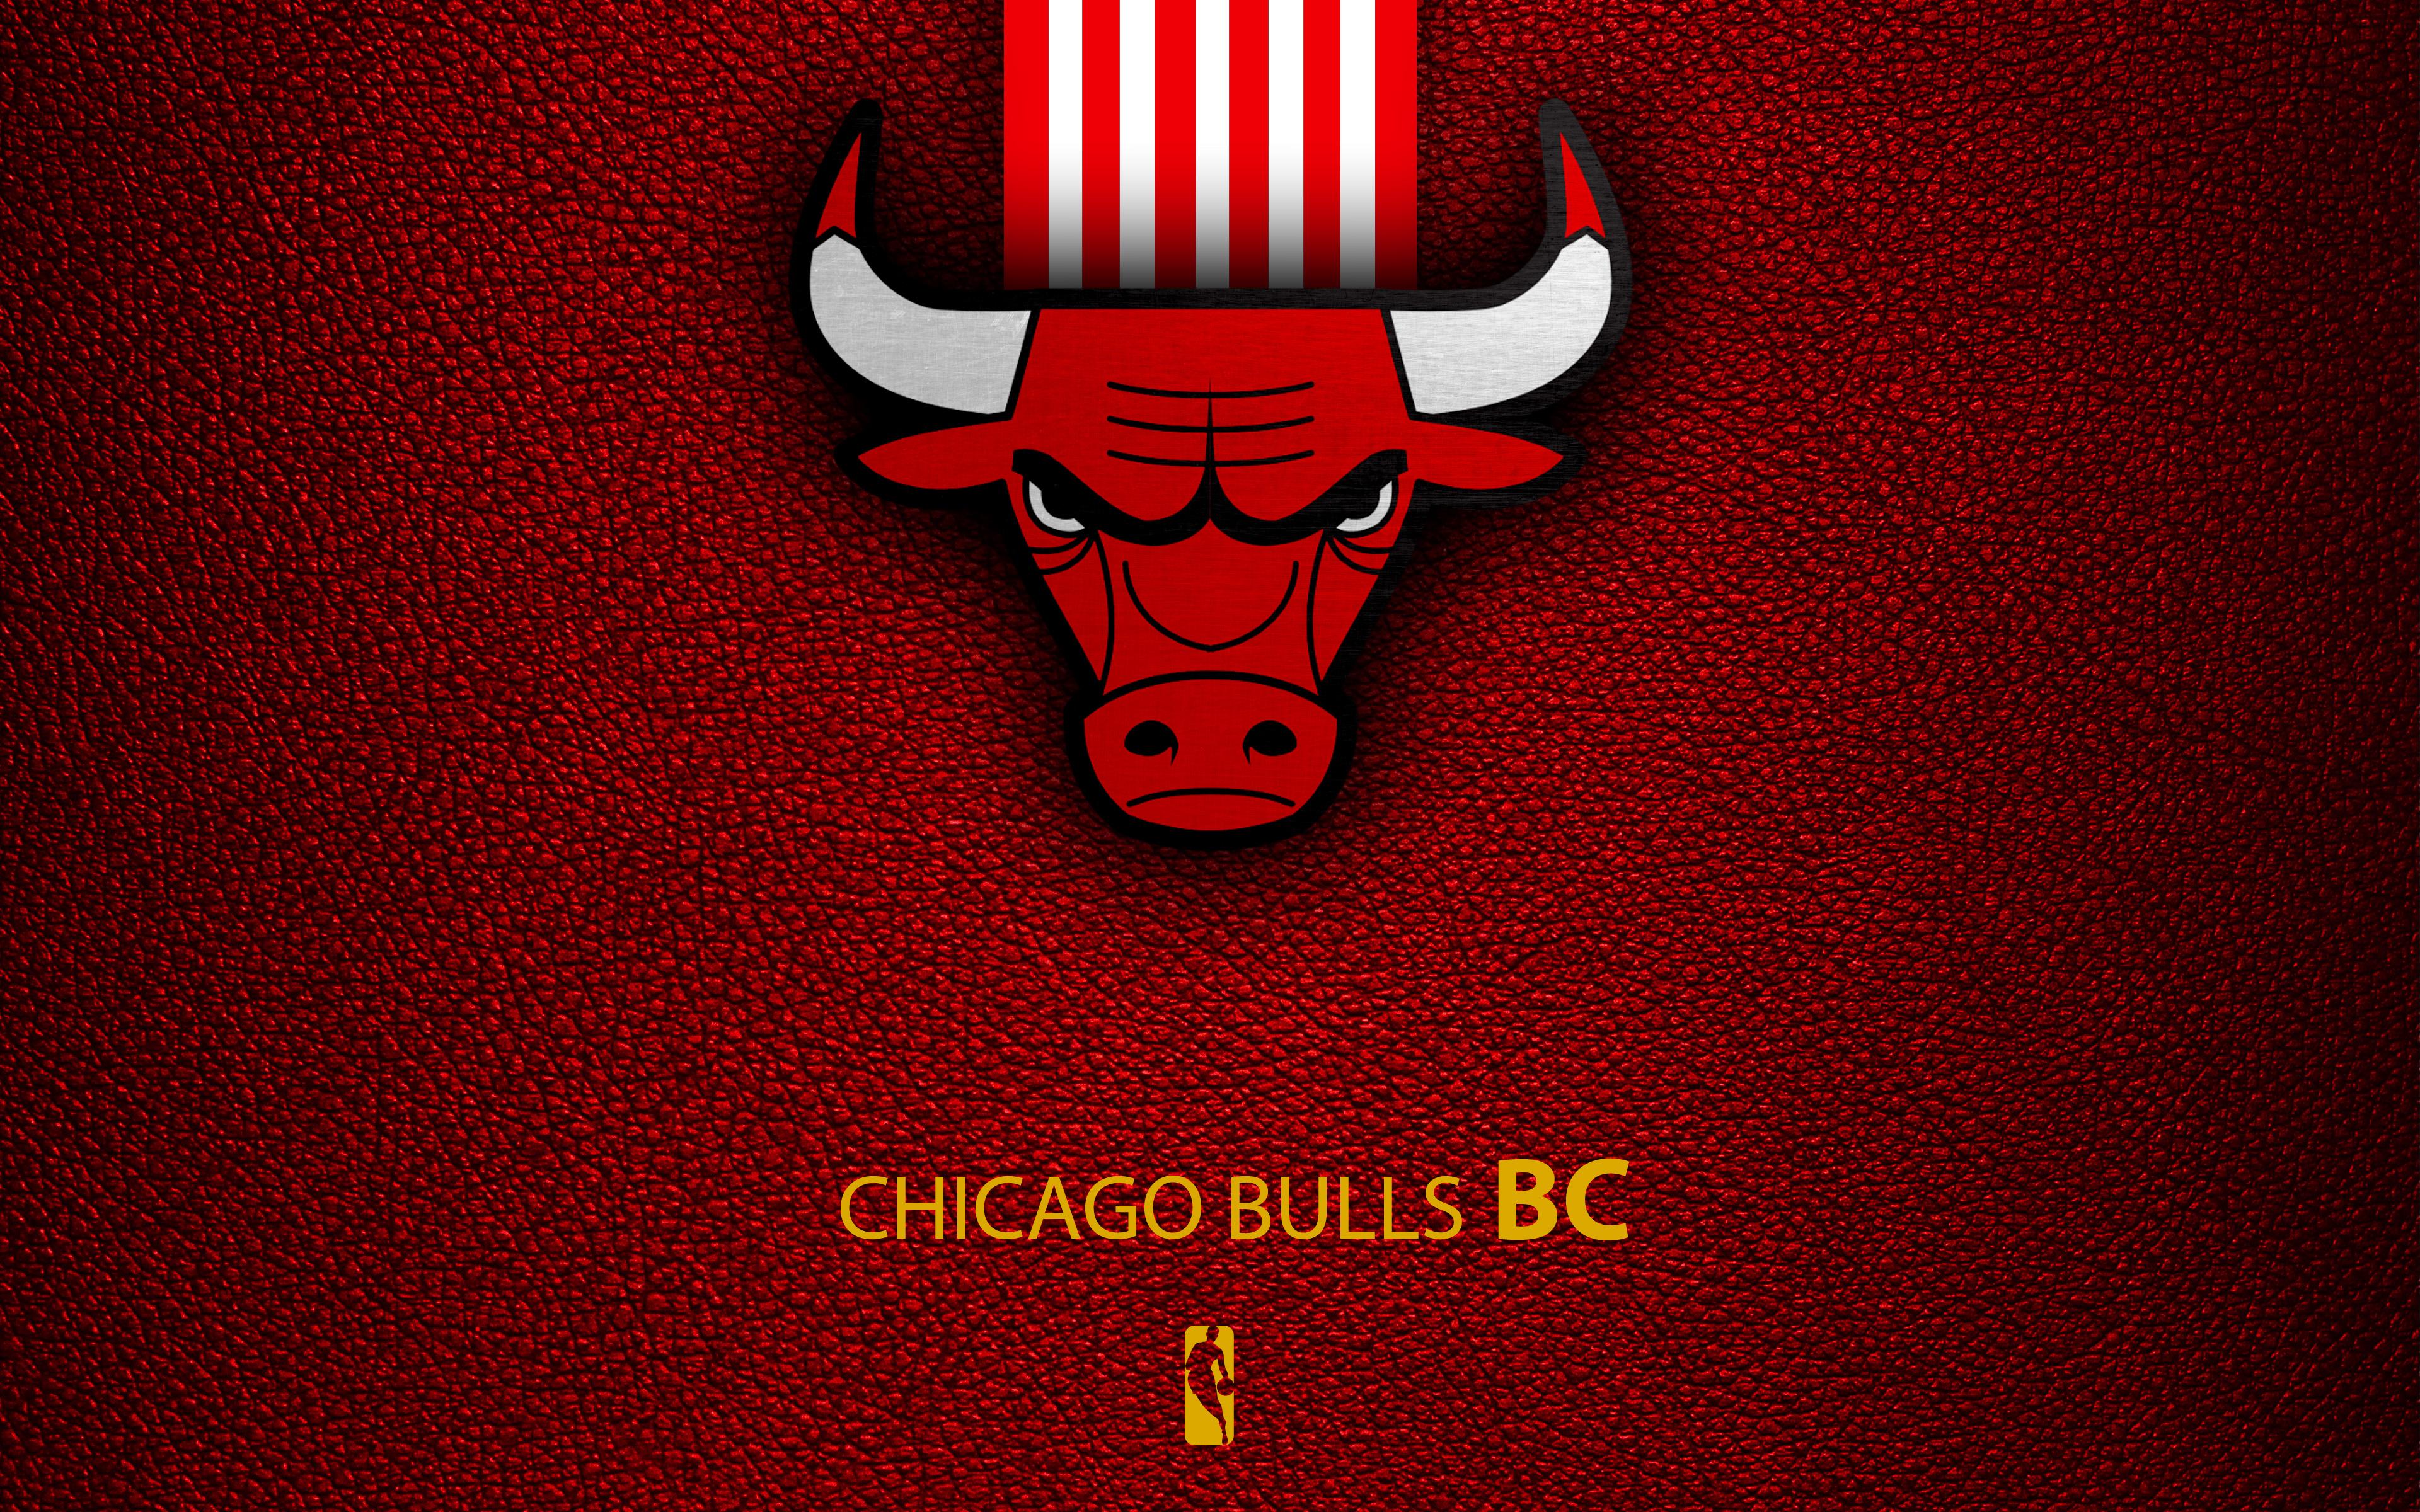 Chicago Bulls Logo 4k Ultra Hd Wallpaper Background Image